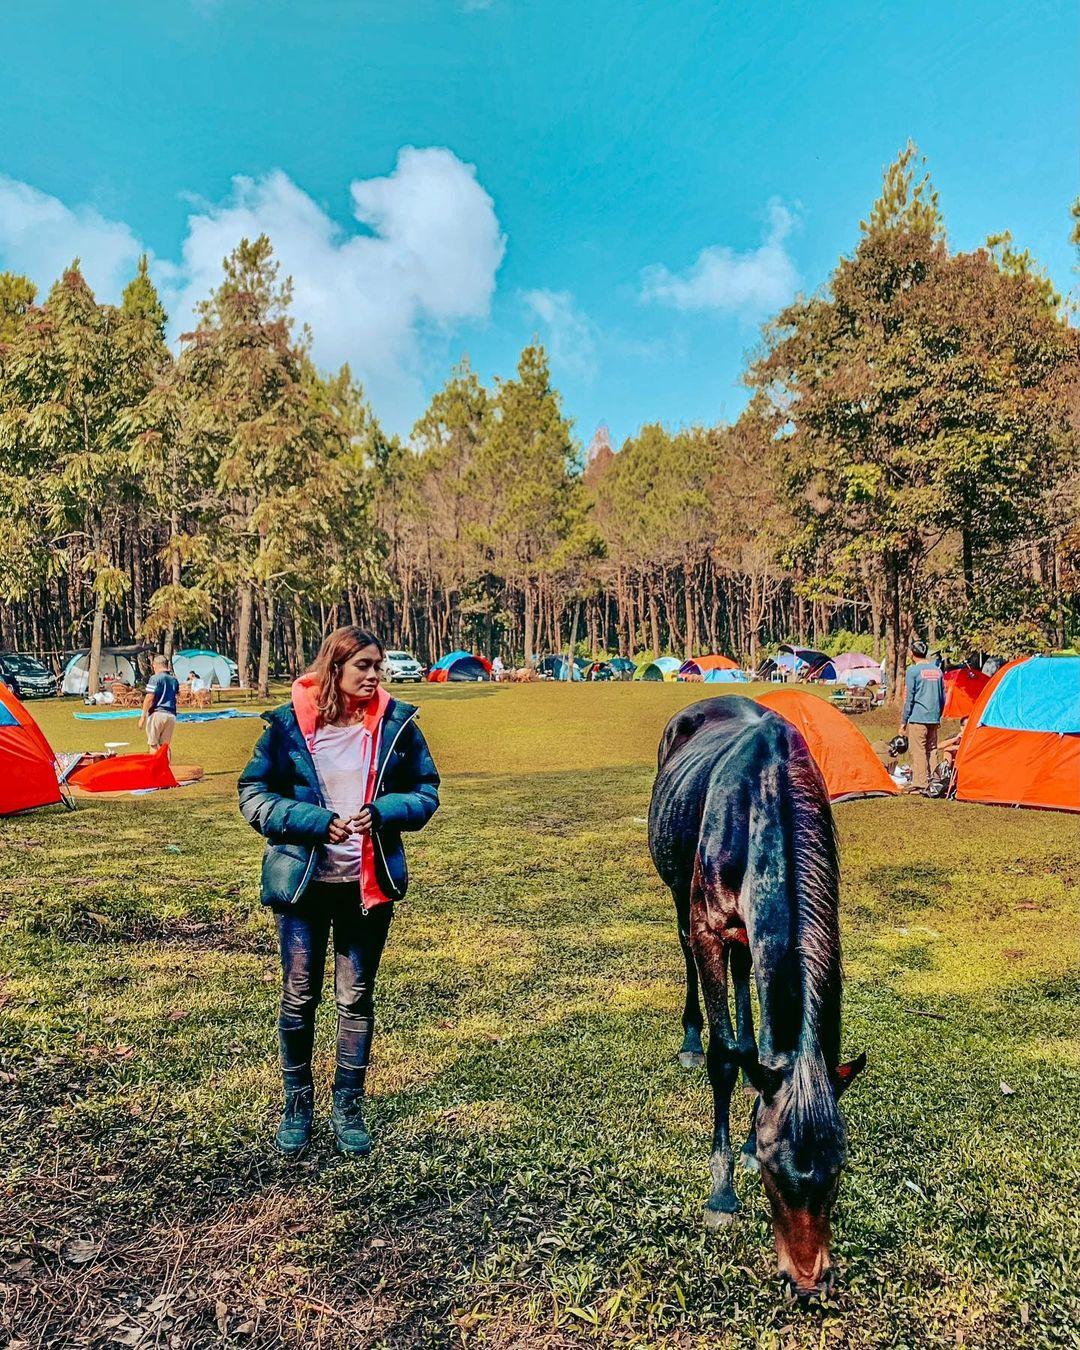 Berfoto Dengan Kuda Di Jungle Milk Lembang Image From @_mels711_